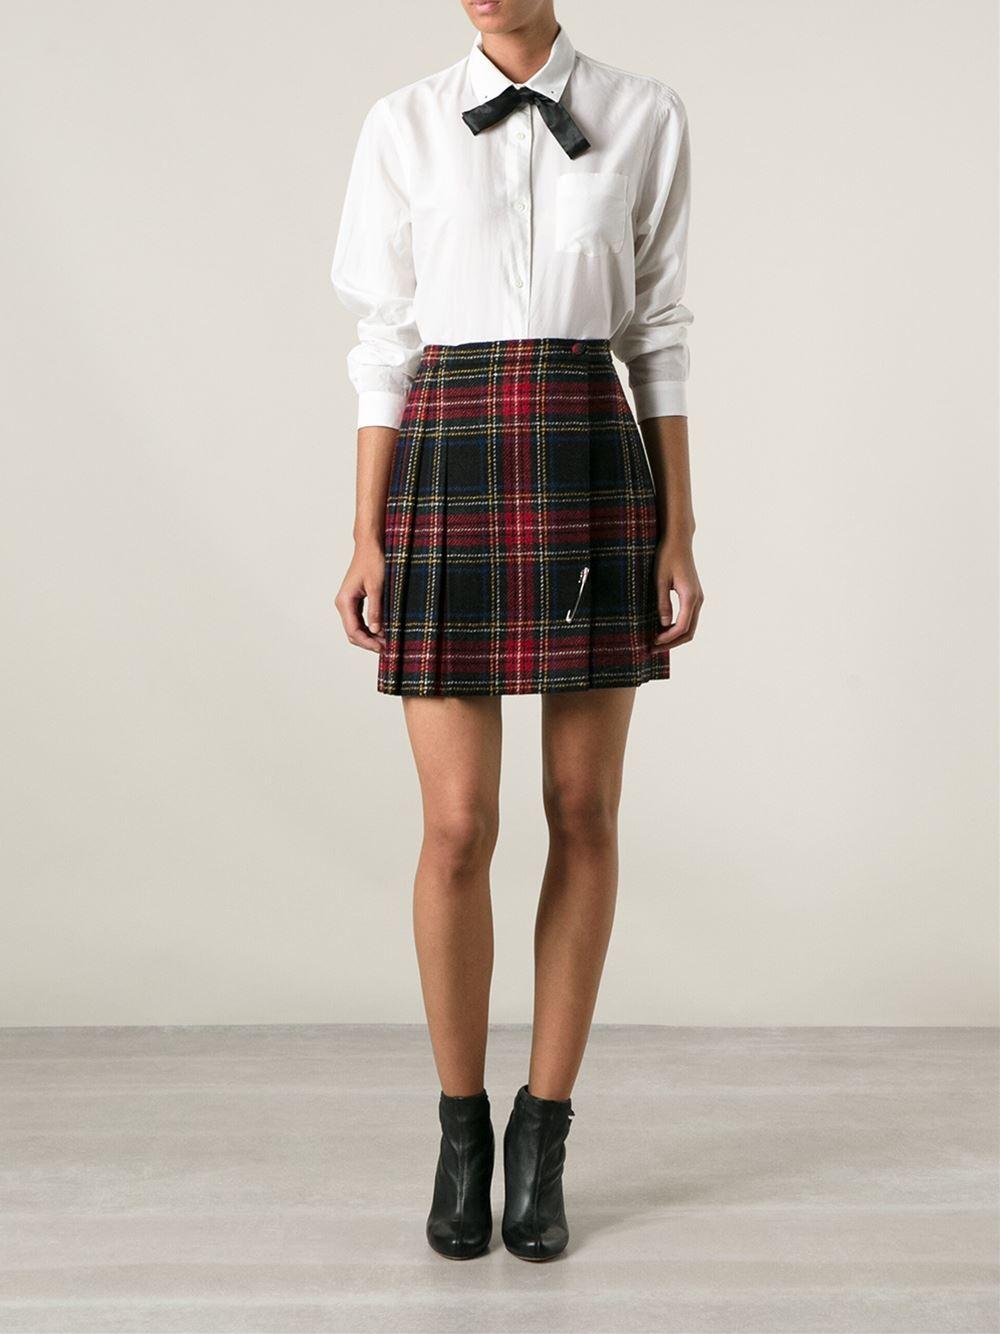 Saint Laurent Tartan Mini Skirt In Red Lyst